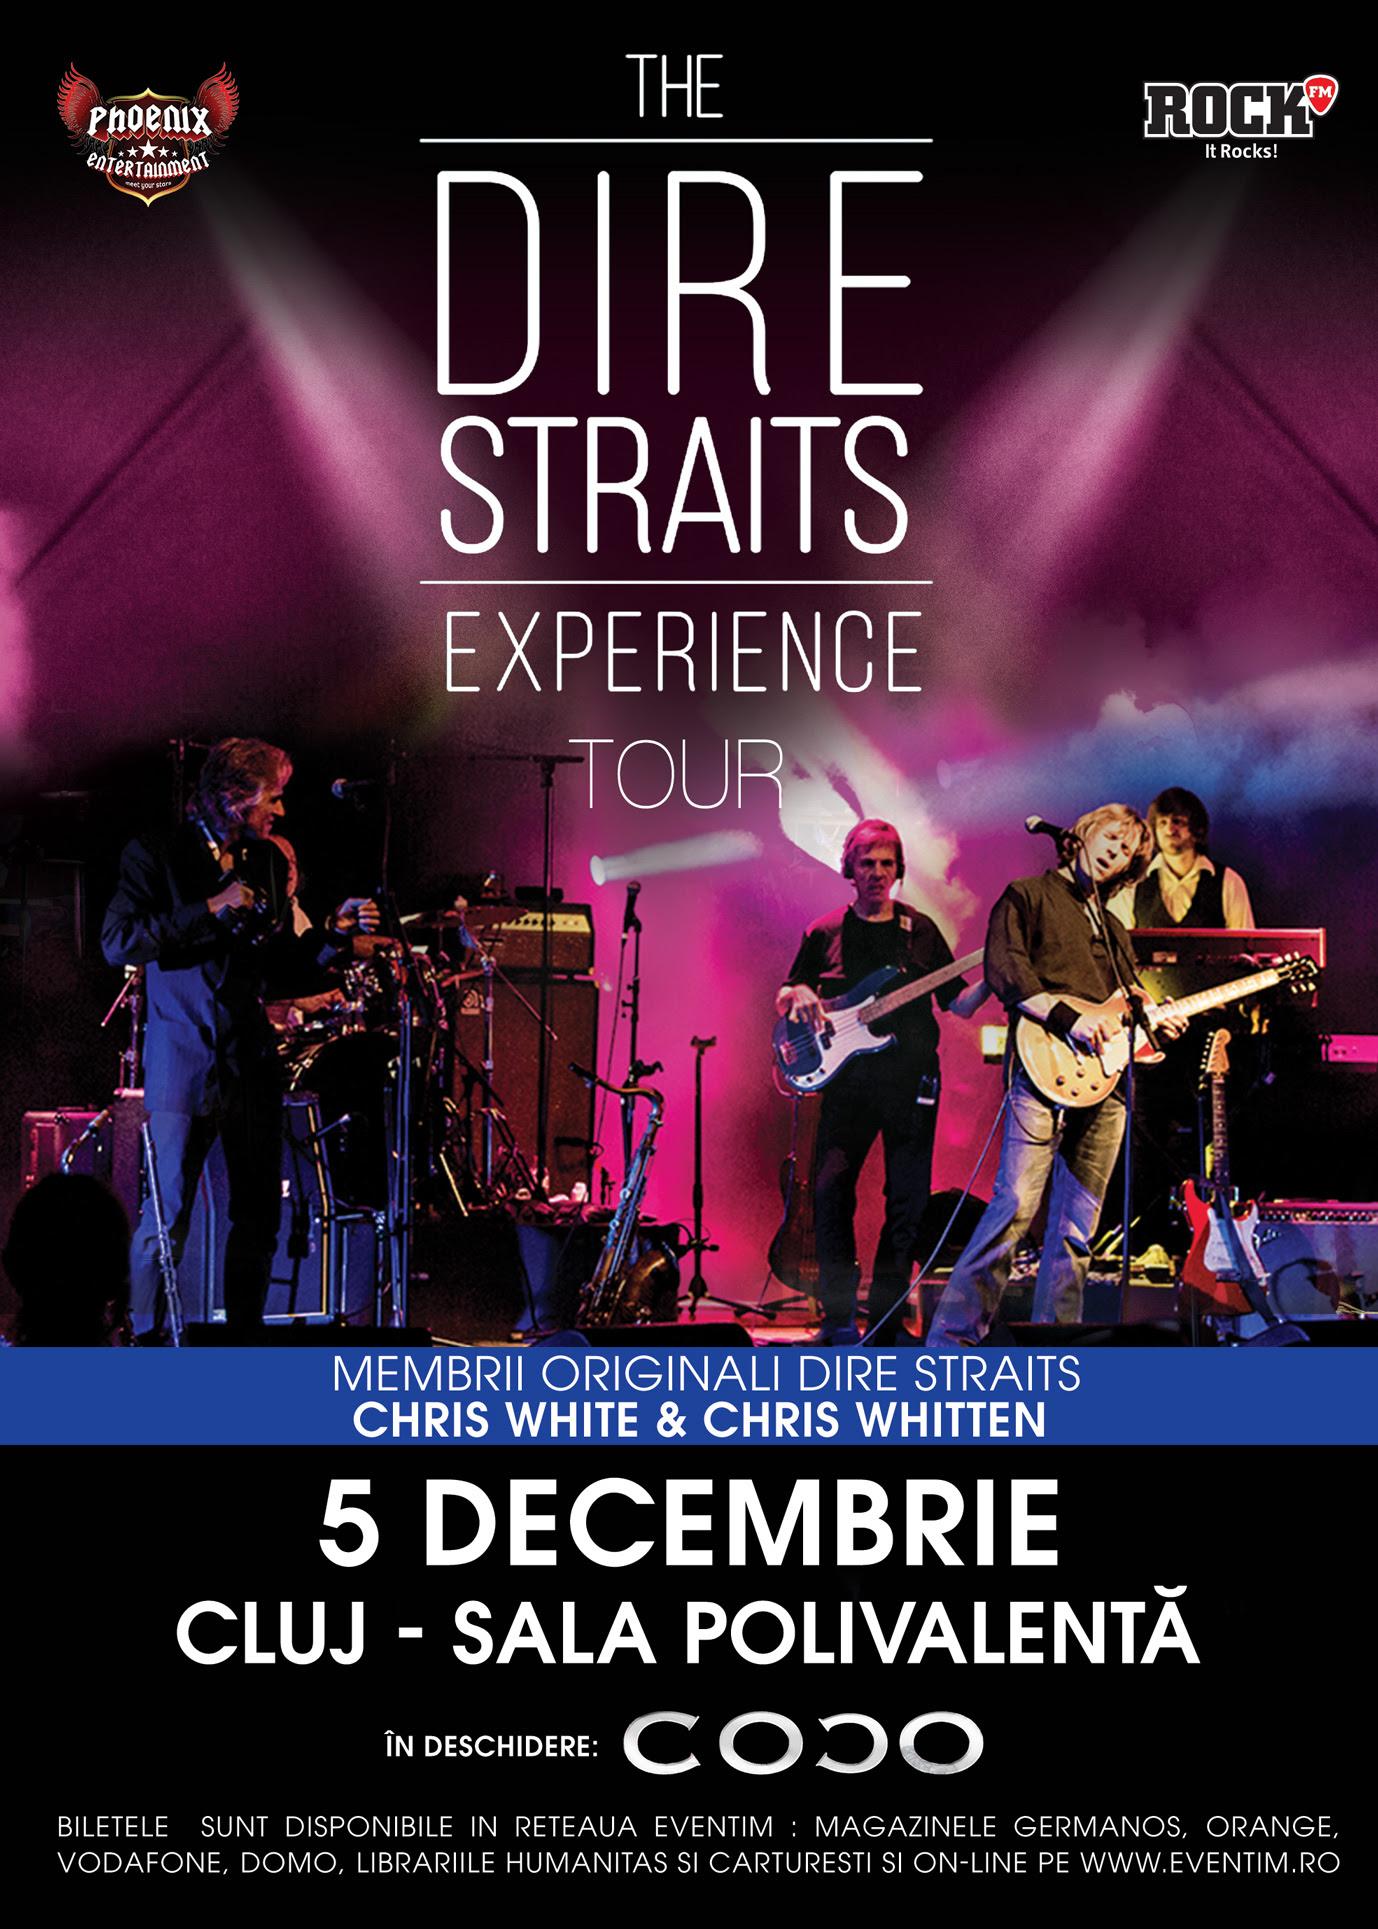 The Dire Straits Experience @ Sala Polivalentă